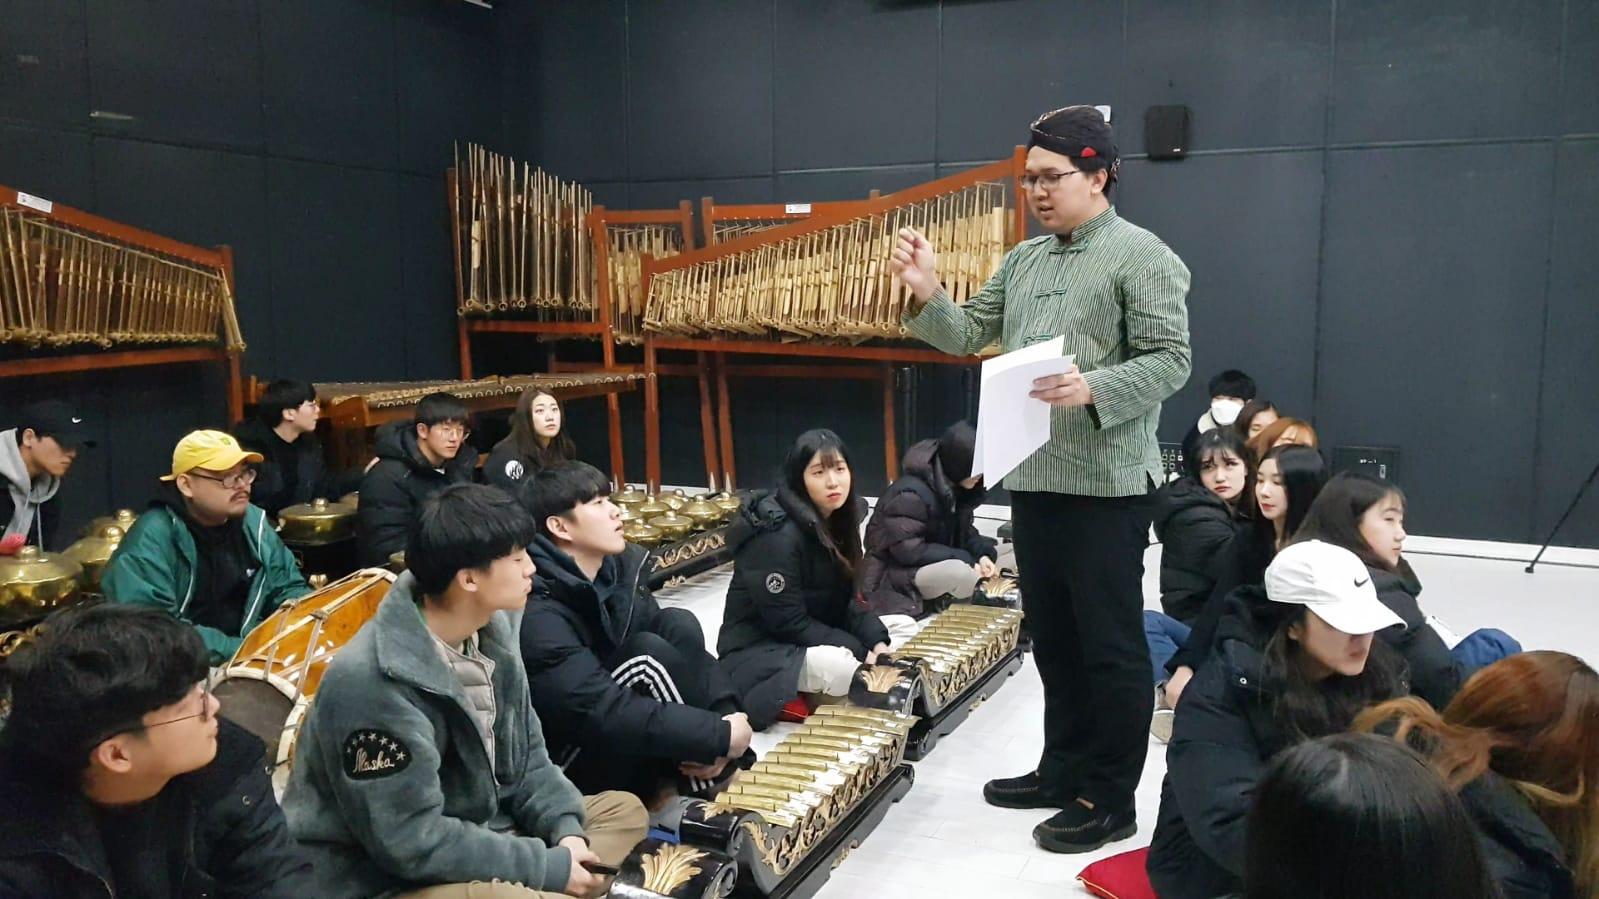 https: img-o.okeinfo.net content 2019 03 14 65 2029761 universitas-seni-di-korea-ajarkan-musik-gamelan-1cVU6blsvR.jpeg